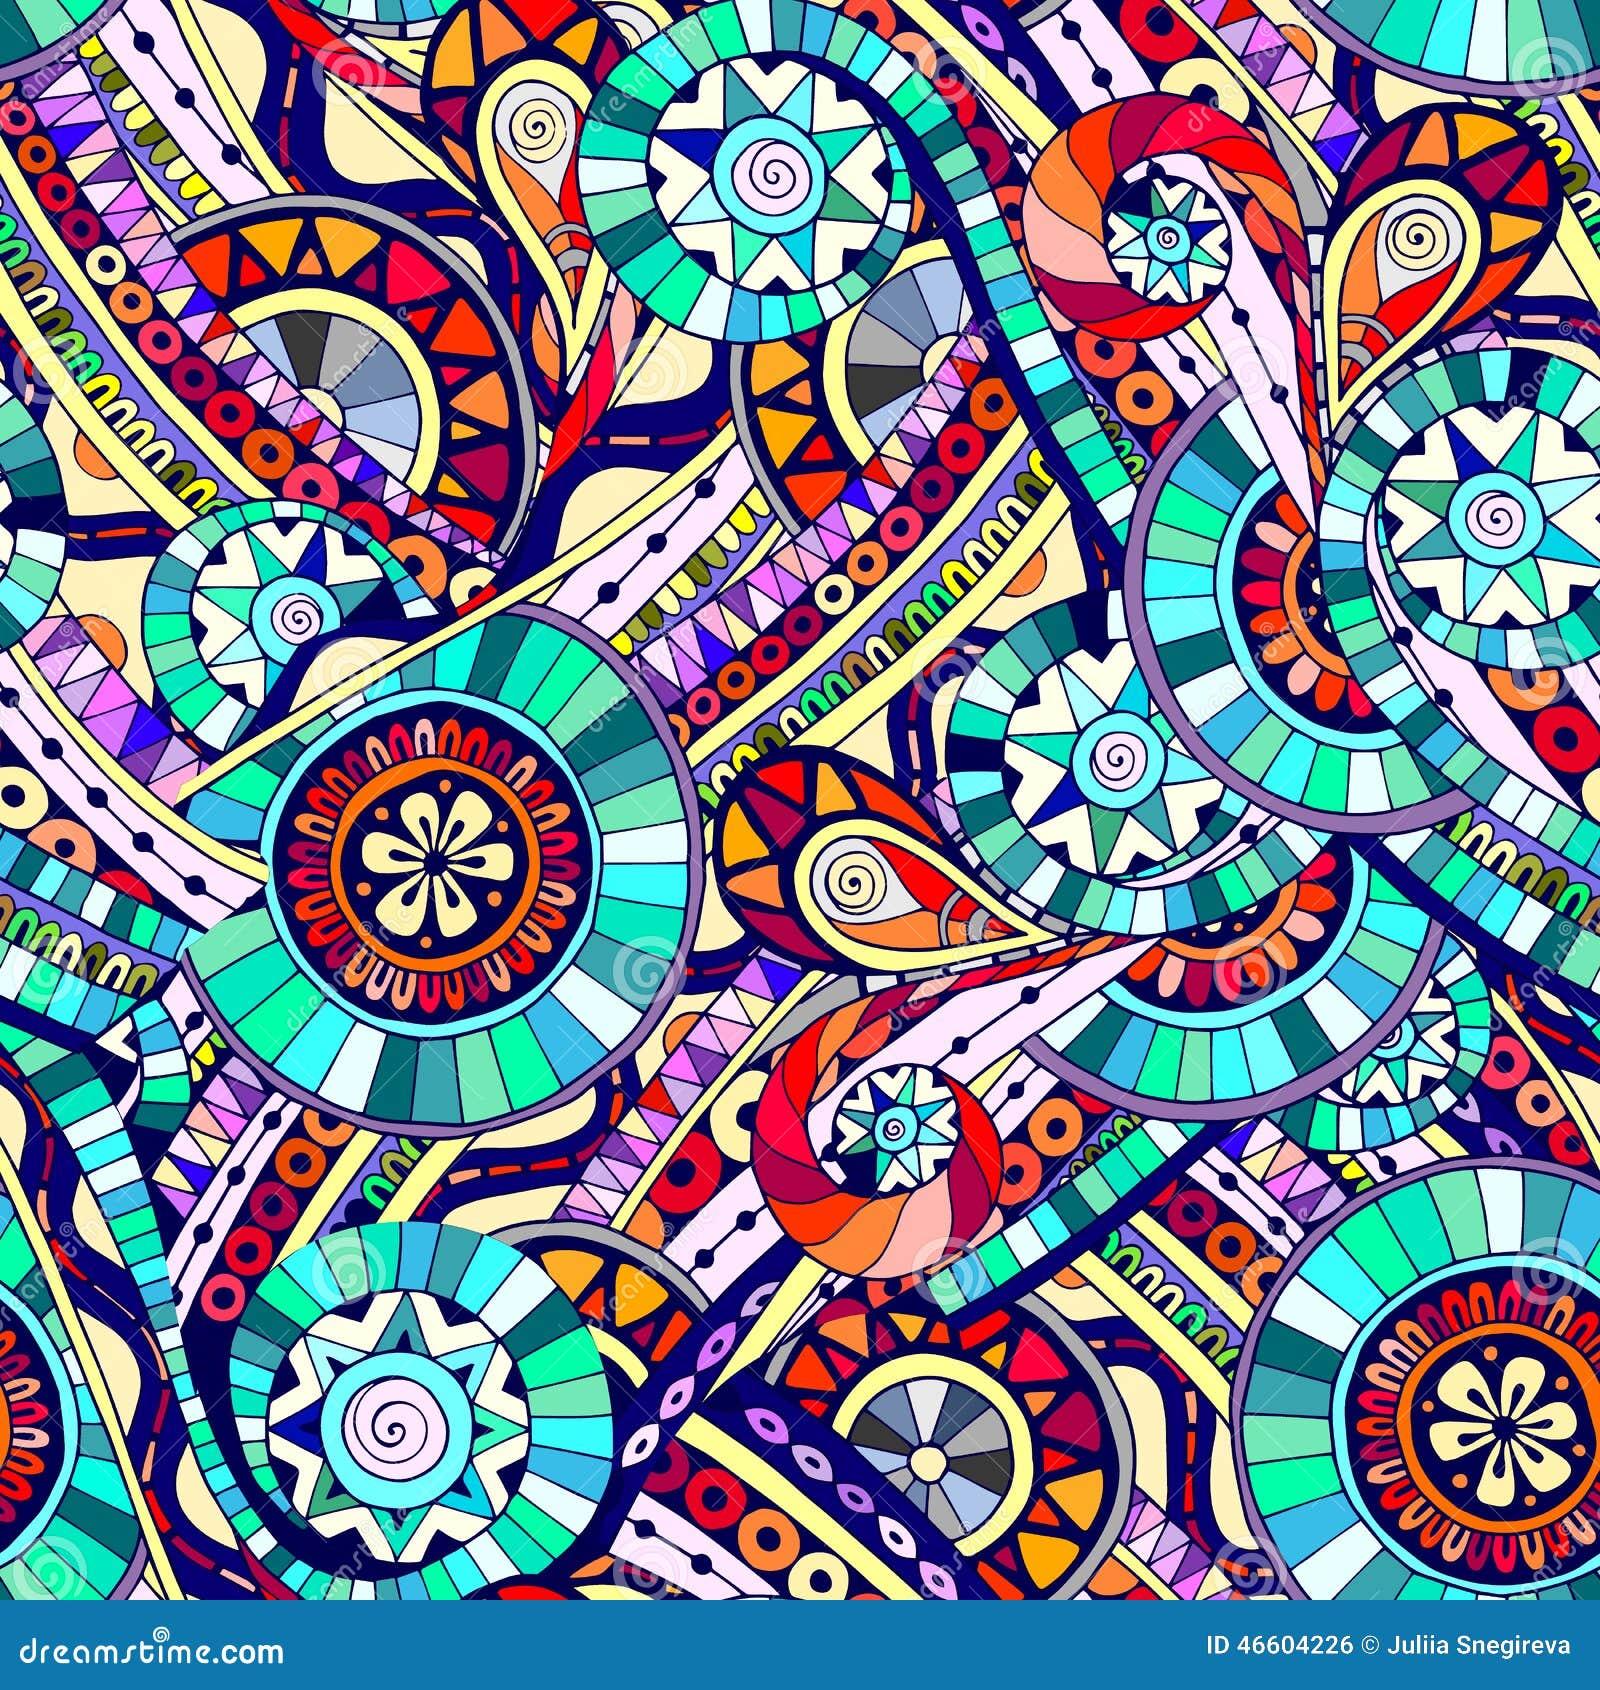 native instruments wallpaper download